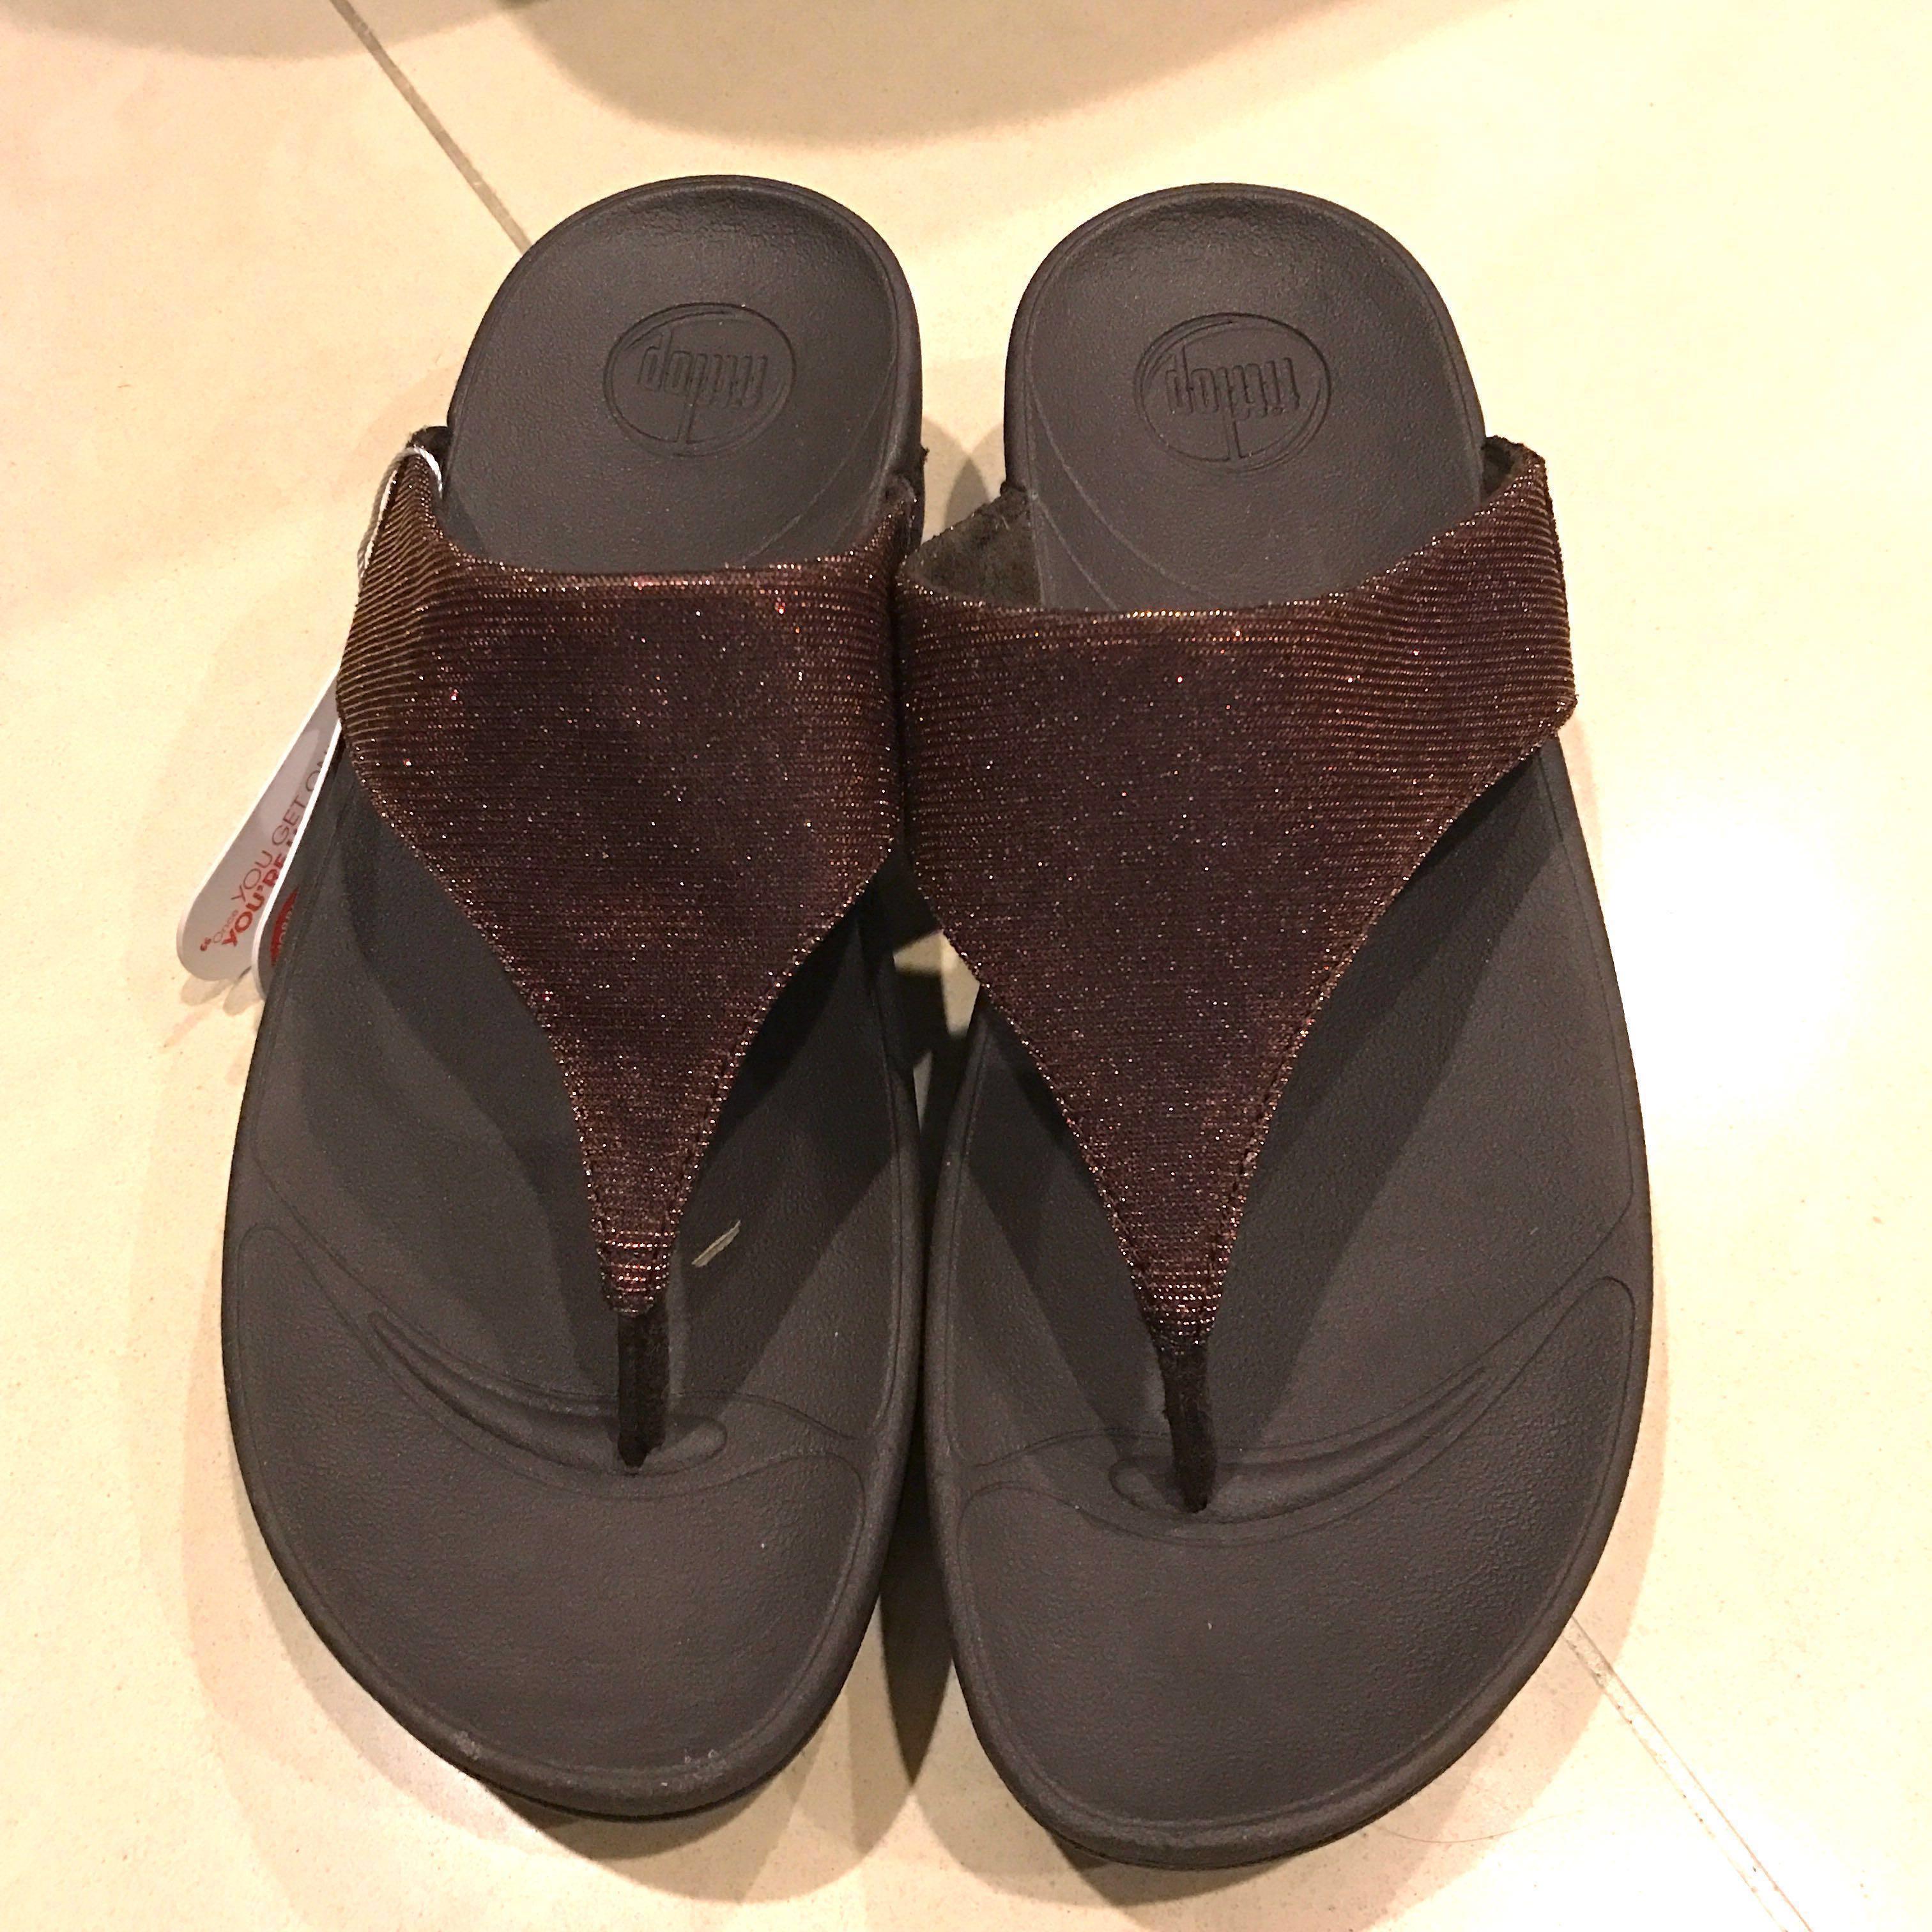 b198d1bec BN Fitflop sandals Superelectra (ladies) UK size 7